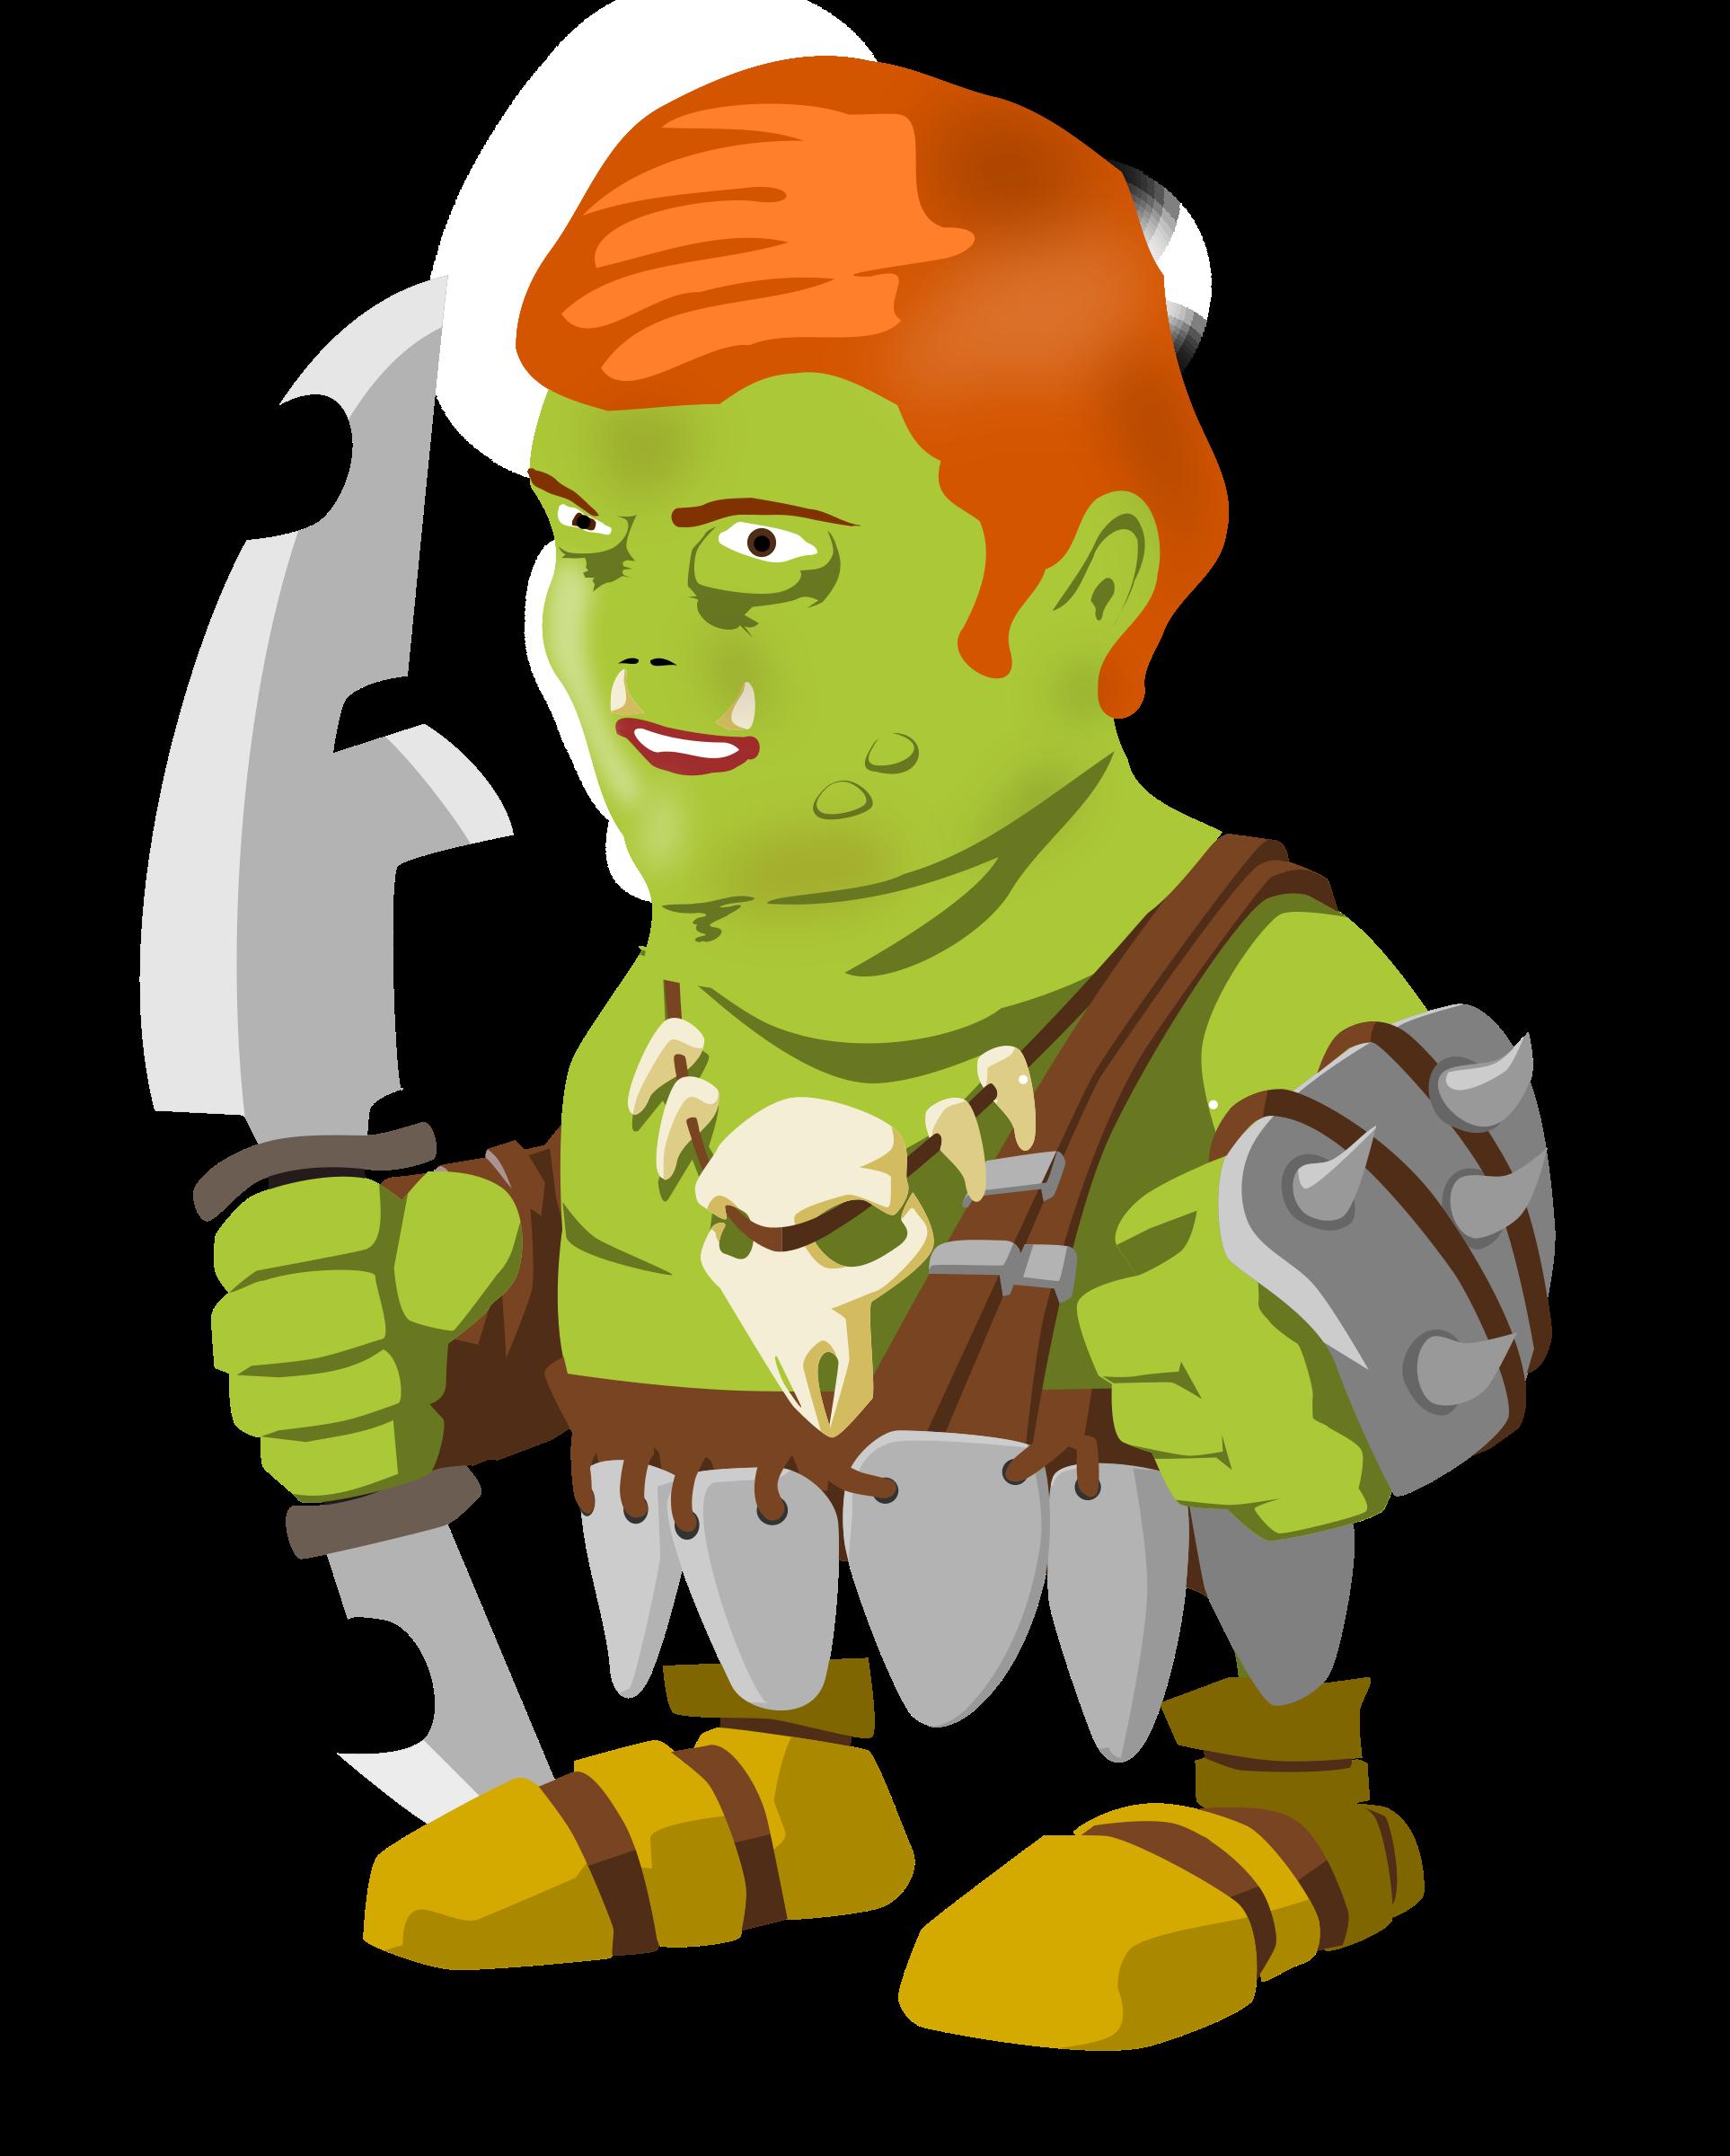 The green goblin big. Warrior clipart original